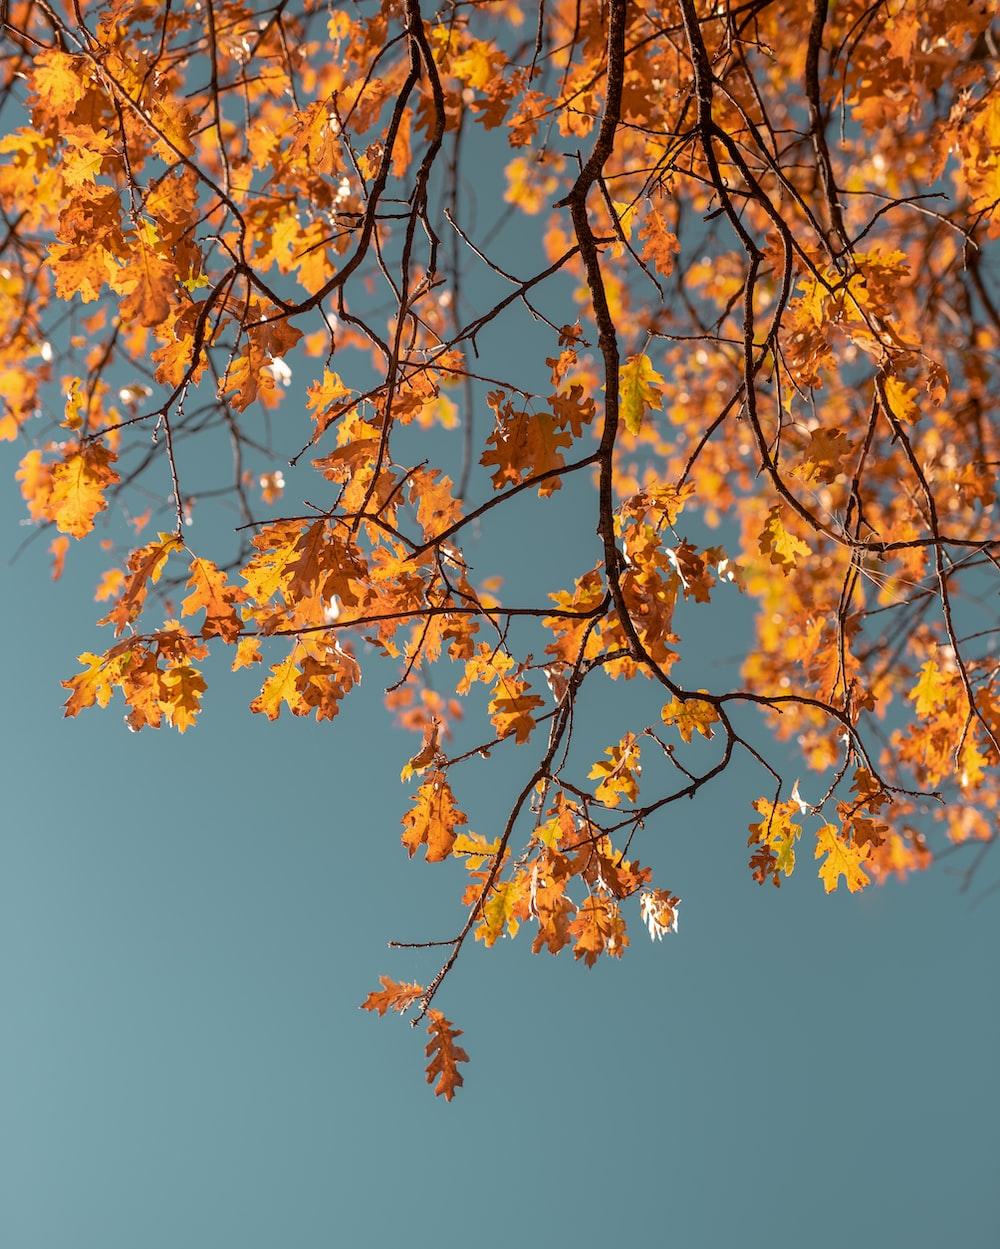 macro photography of orange leaf tree